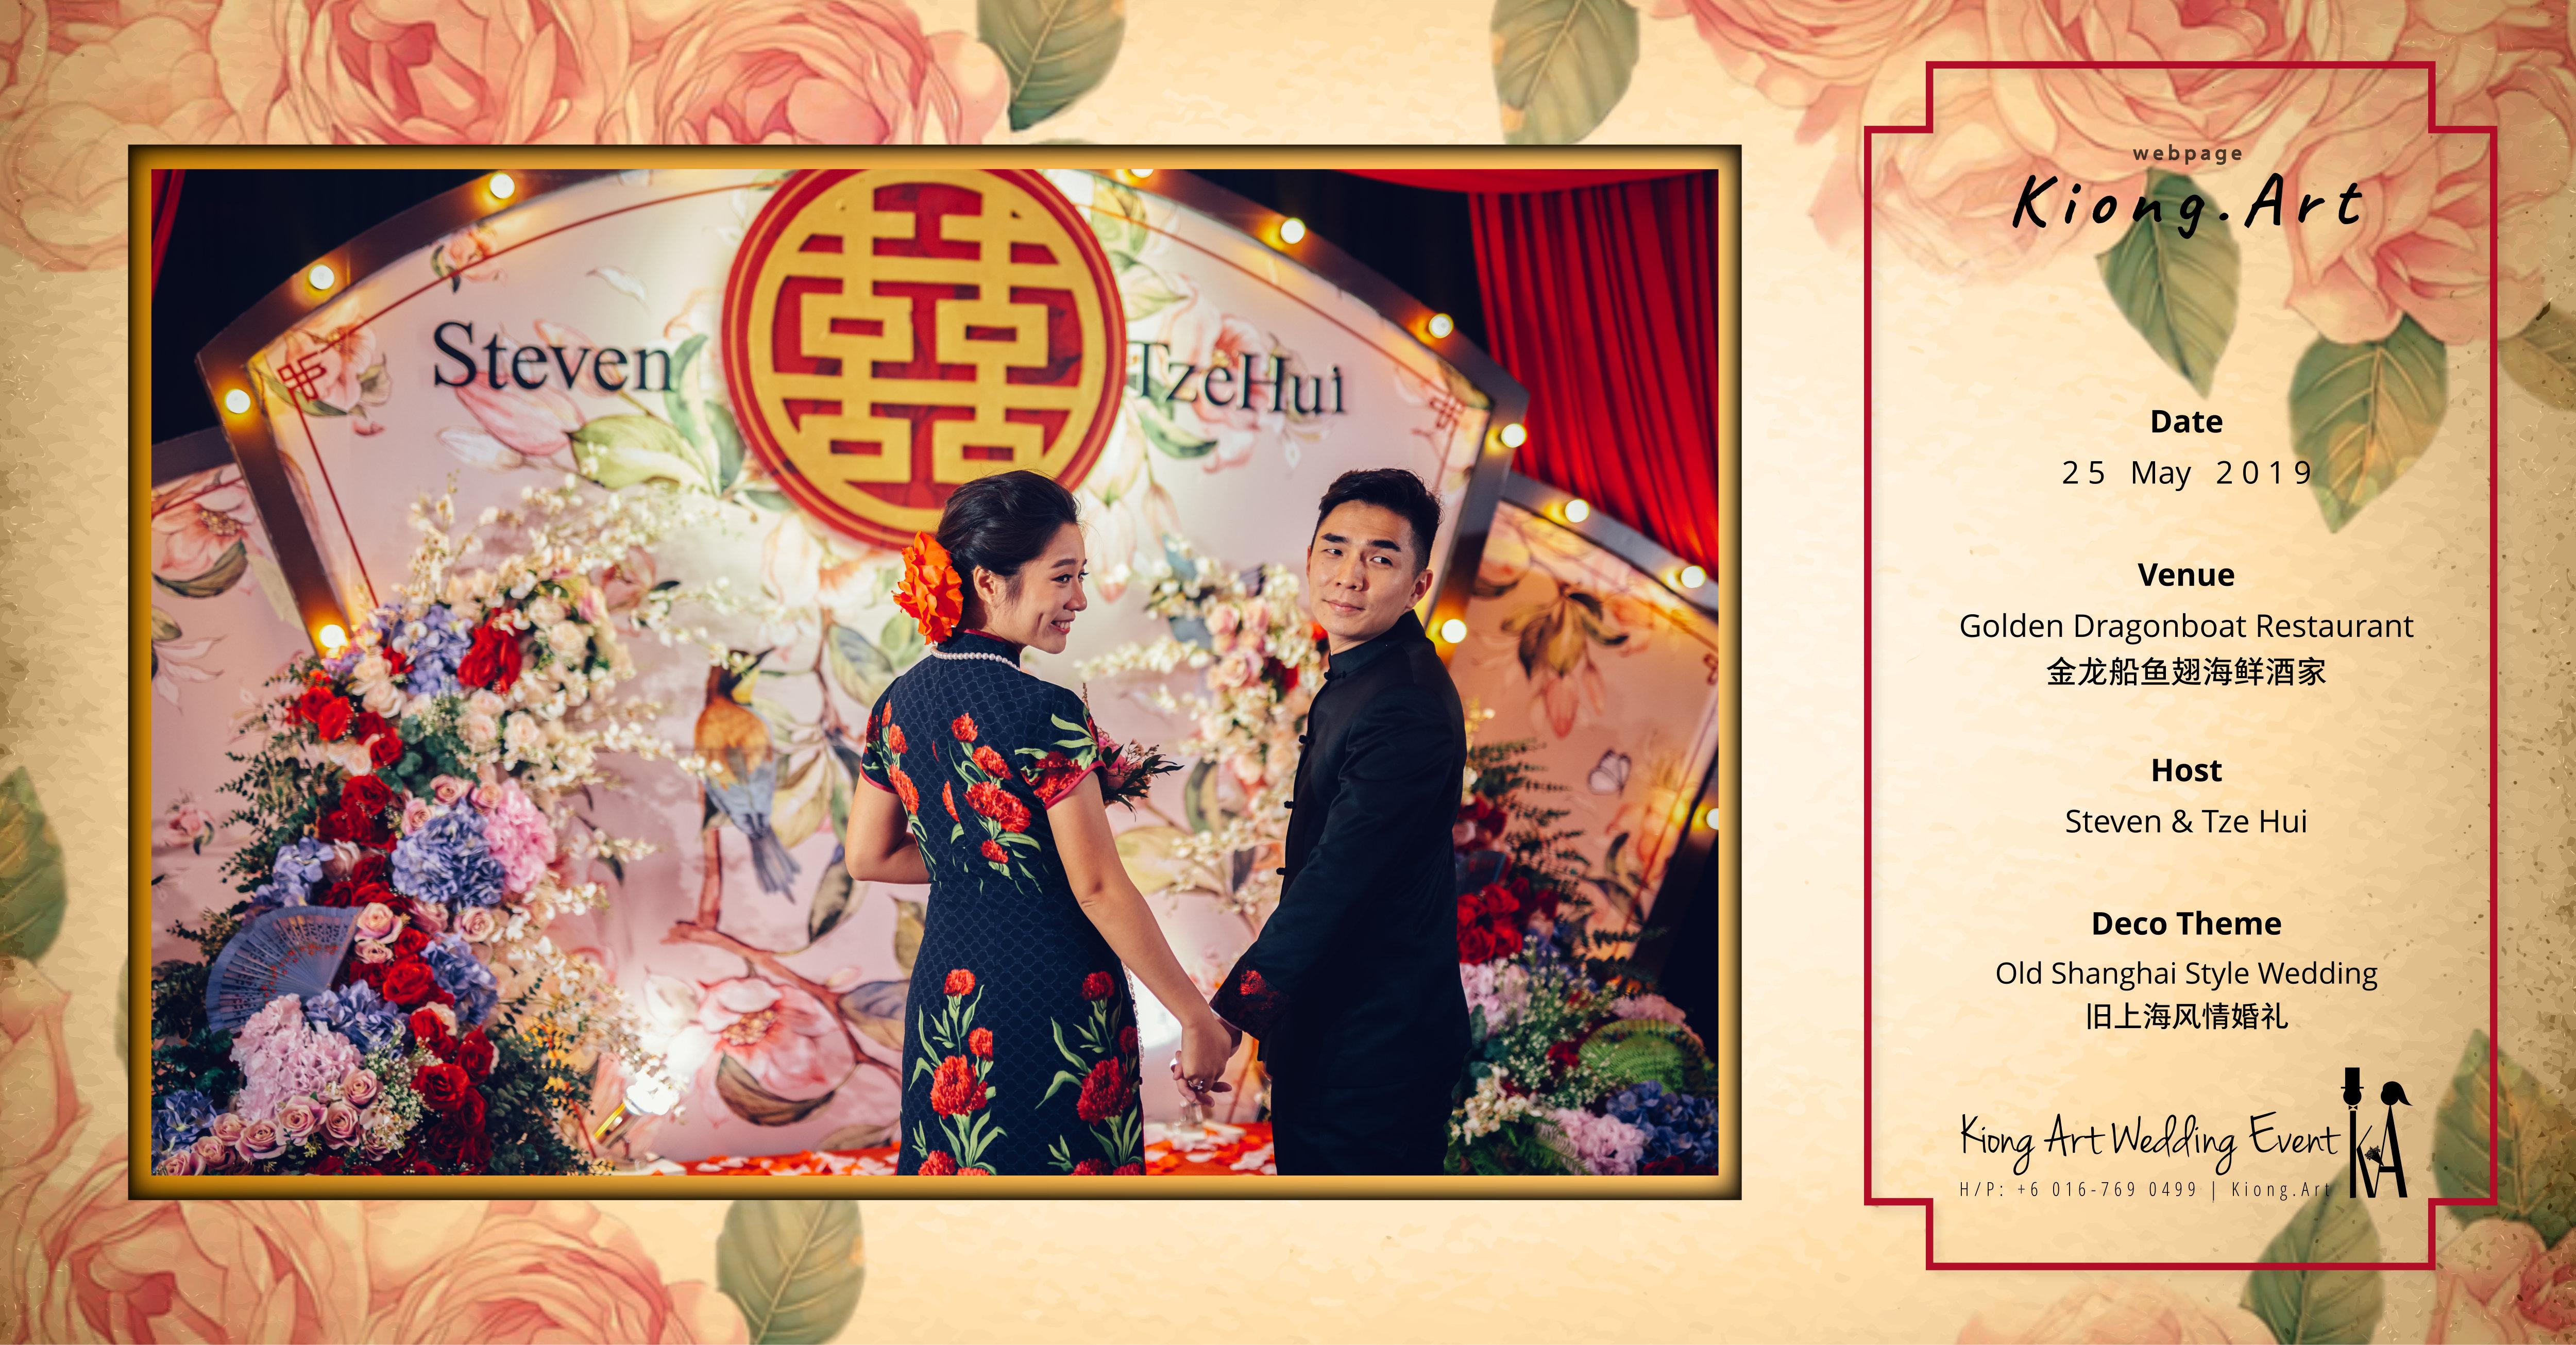 Kuala Lumpur Wedding Deco Decoration Kiong Art Wedding Deco Old Shanghai Style Wedding 旧上海风情婚礼 Steven and Tze Hui at Golden Dragonboat Restaurant 金龙船鱼翅海鲜酒家 Malaysia A16-B00-005